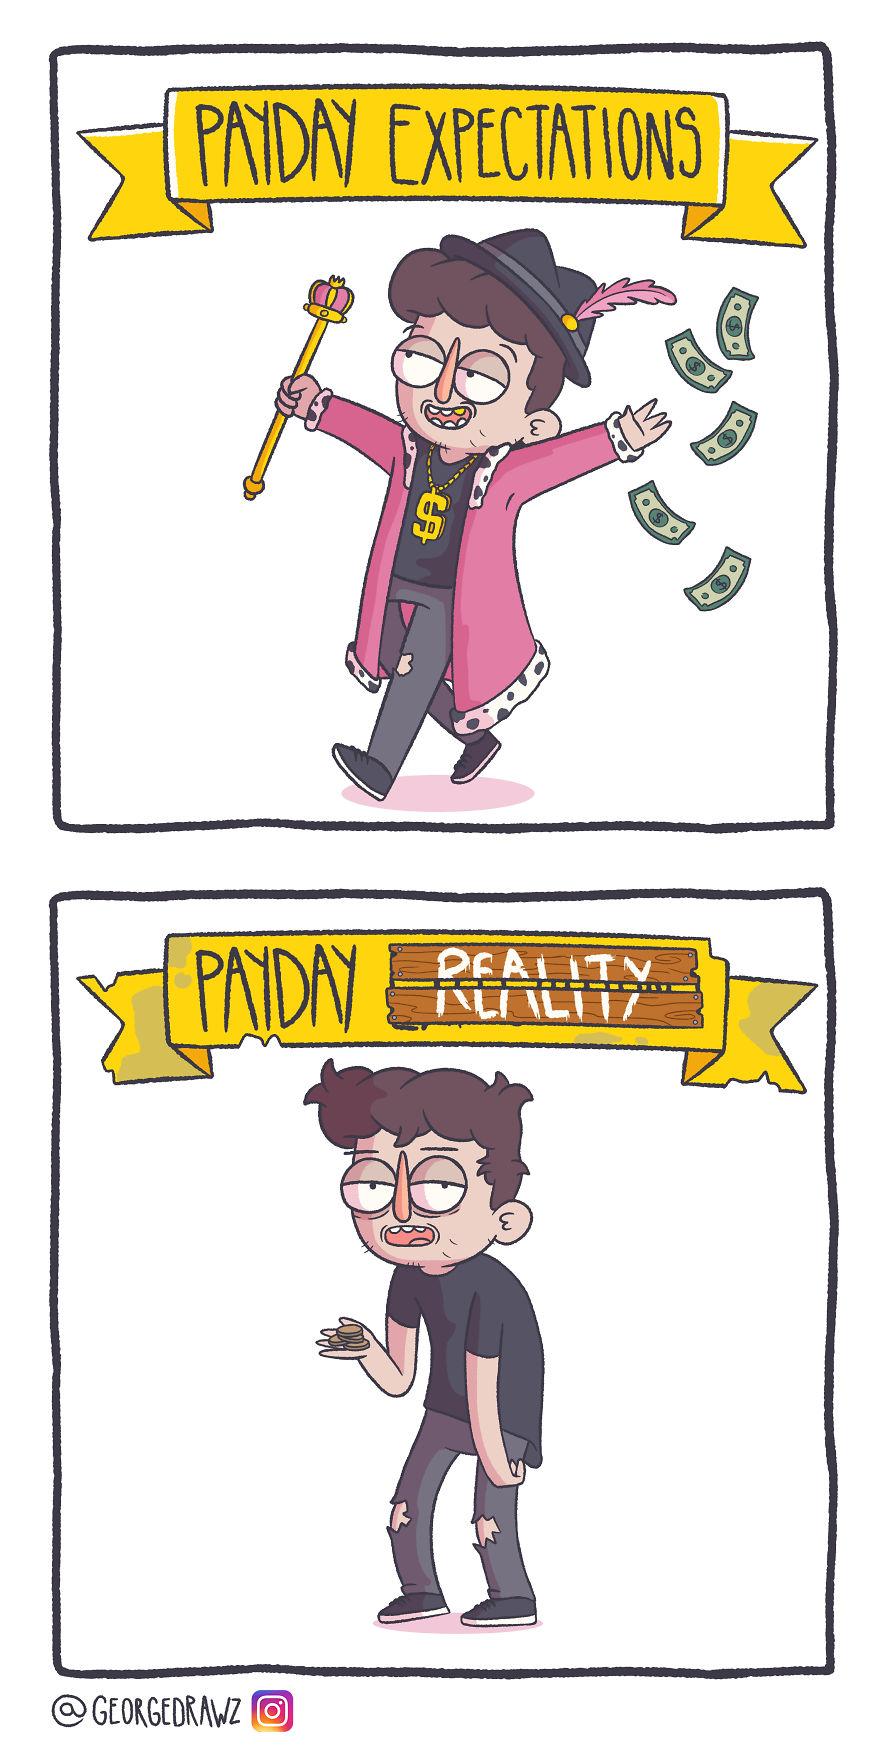 #22 Paydays